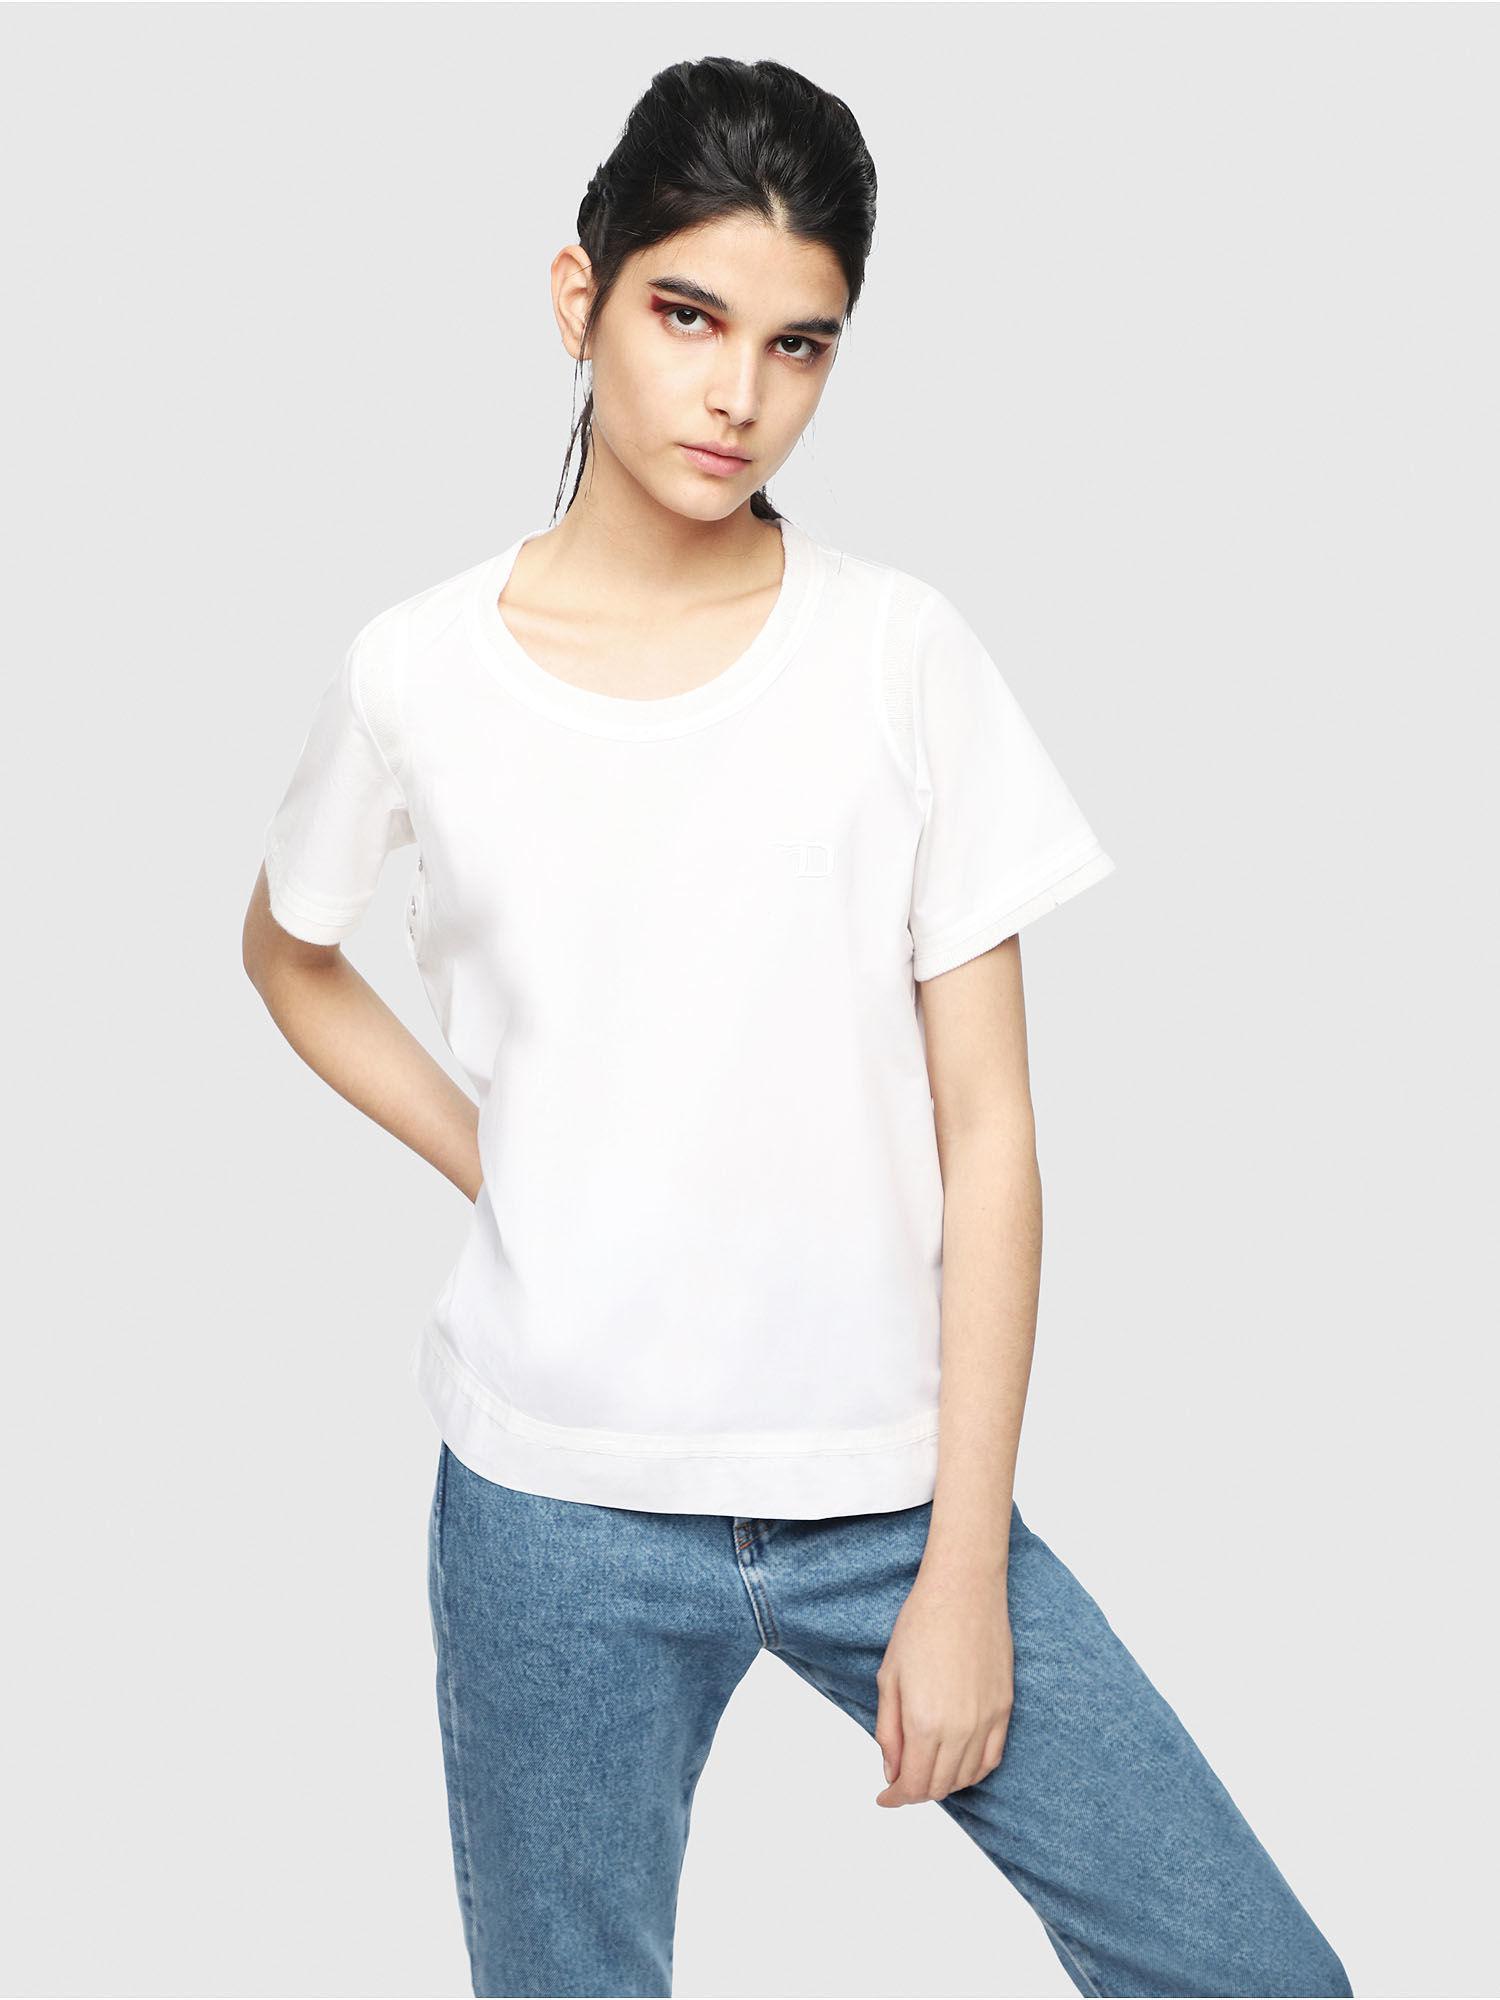 924bf21802b9 DIESEL - White Poplin T-shirt With Tonal Trims - Lyst. View fullscreen